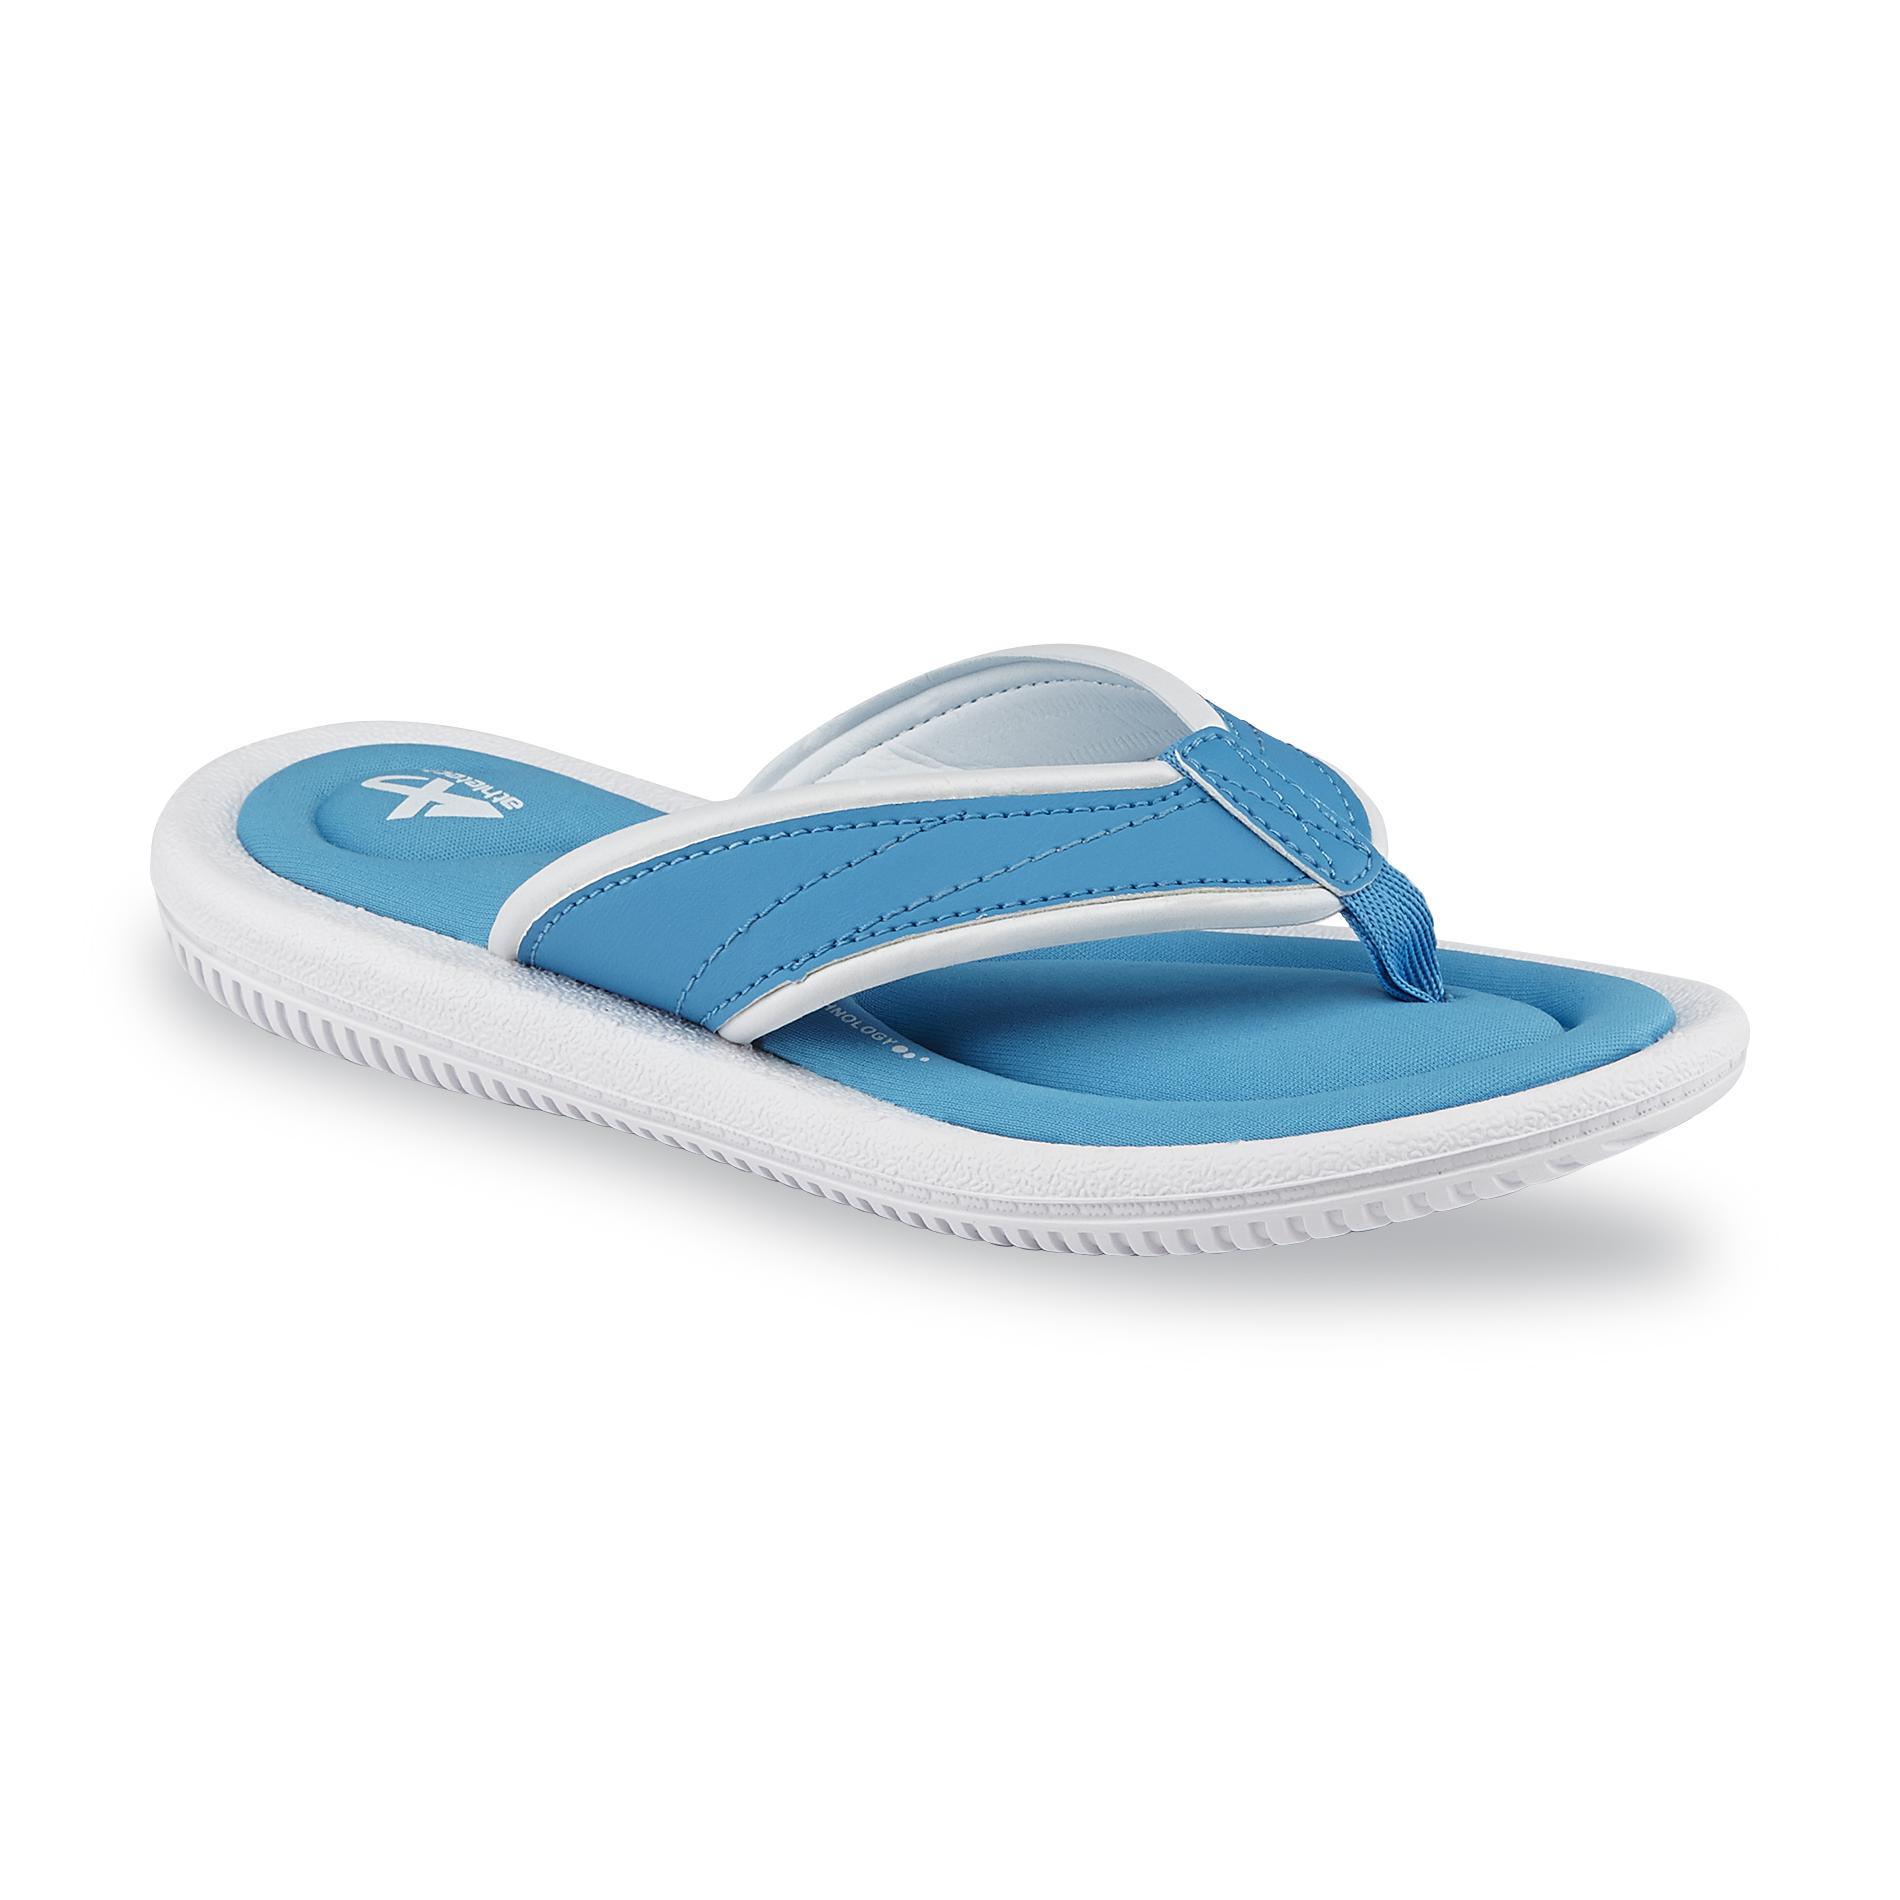 Athletech Women's Alayna Teal/White Memory Foam Flip-Flop Sandal